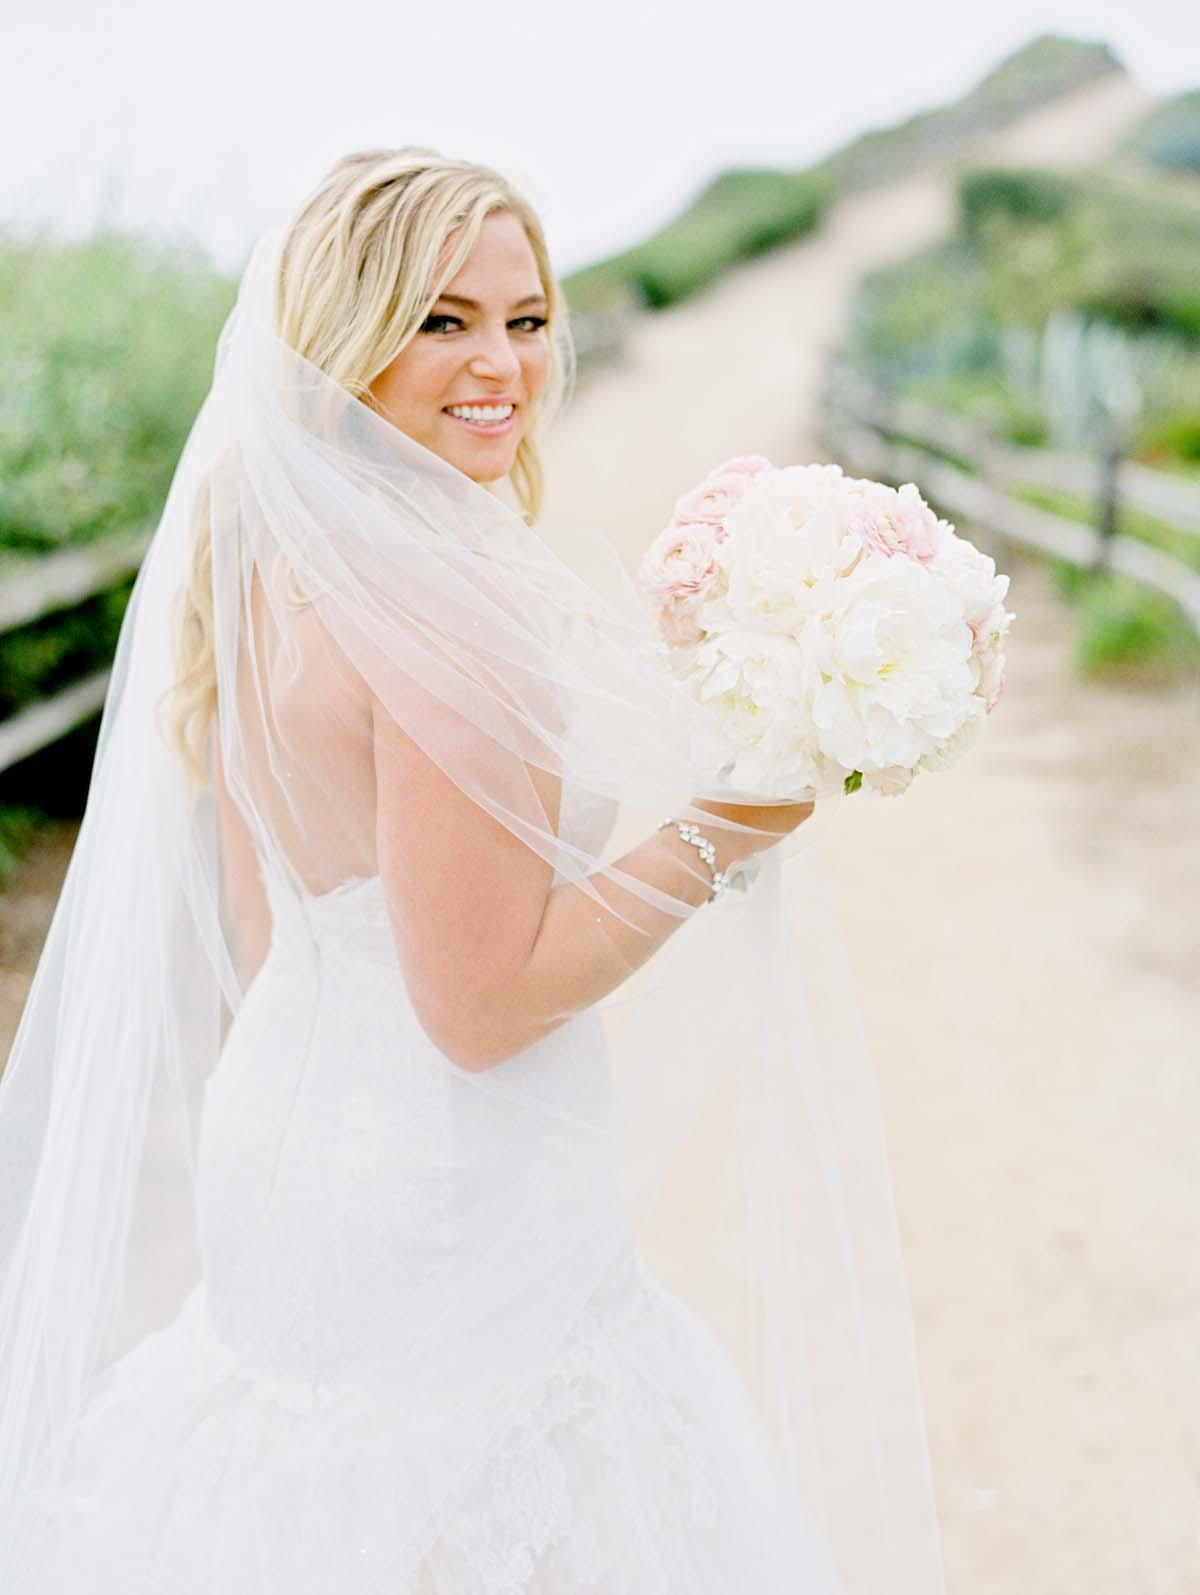 XOXO-BRIDE-Events_Michael-Anna-Costa-Photography-0016